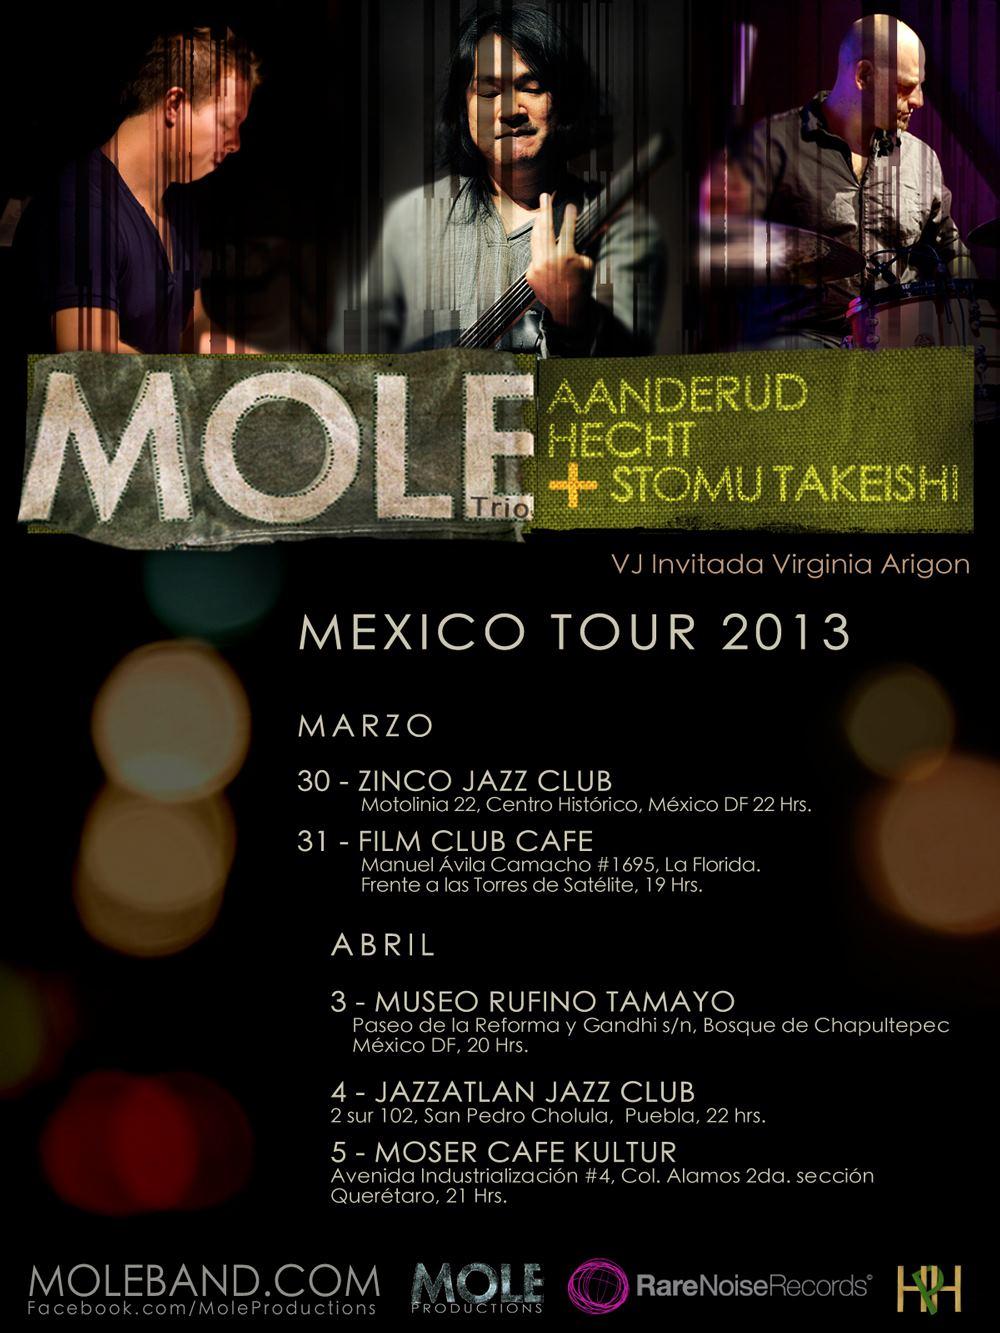 MOLE Trio - Mark Aanderud, Hernan Hecht and Stomu Takeishi on Tour 2